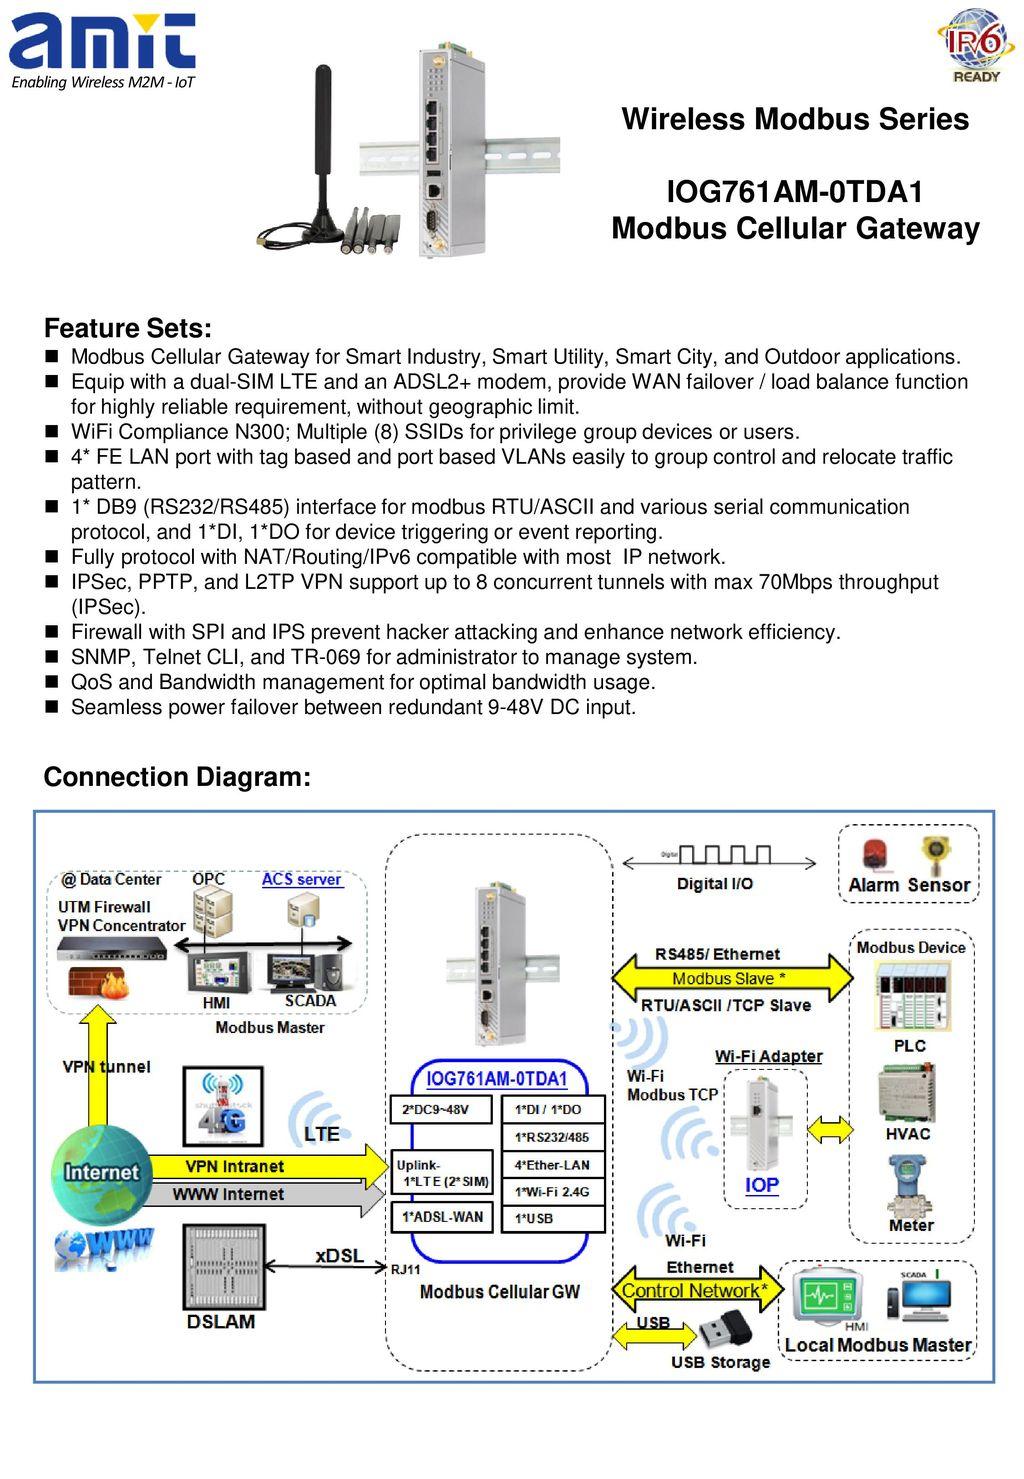 Wireless Modbus Series Iog761am 0tda1 Cellular Gateway Ppt Vpn Diagram